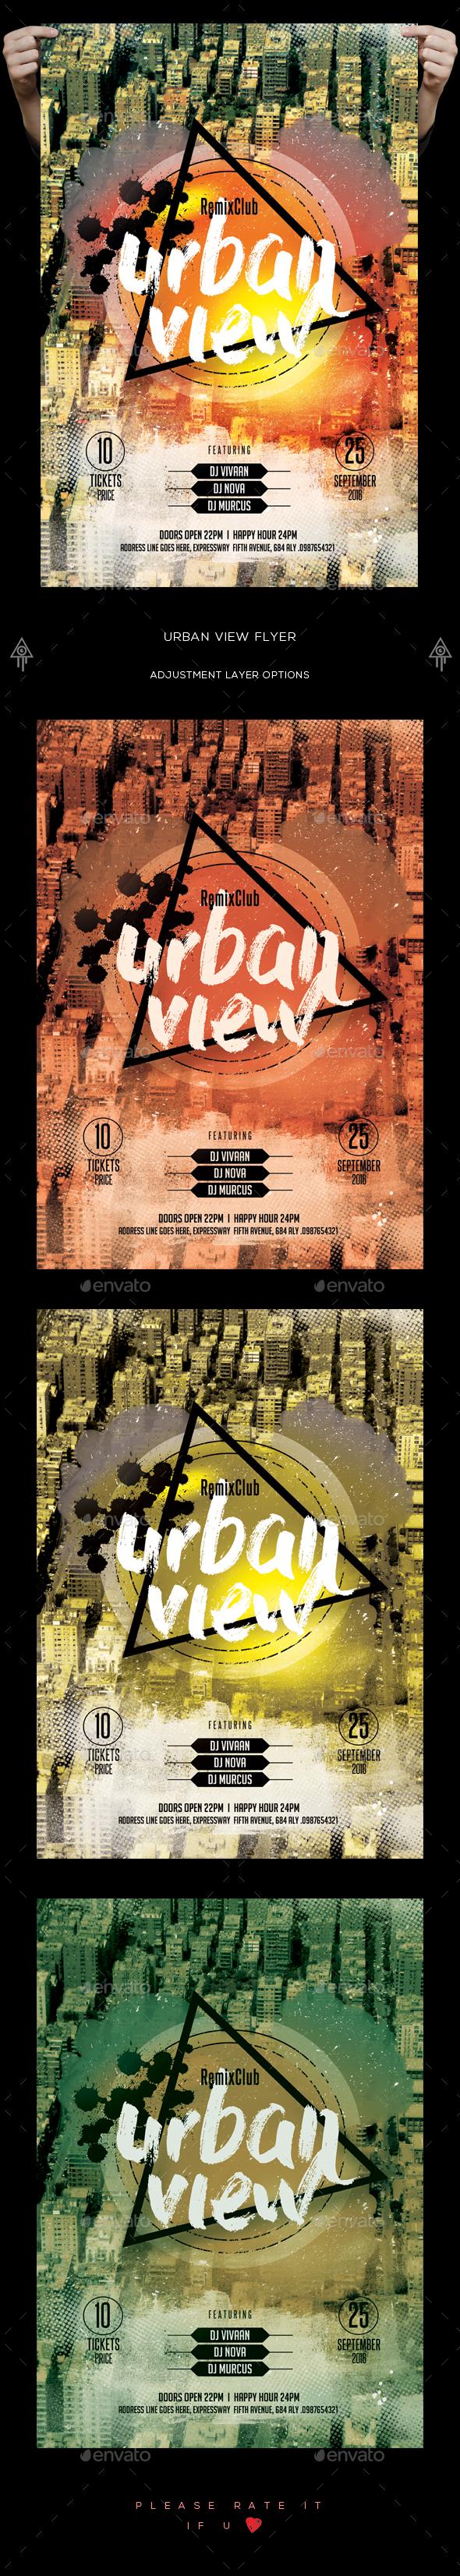 Urban View Flyer